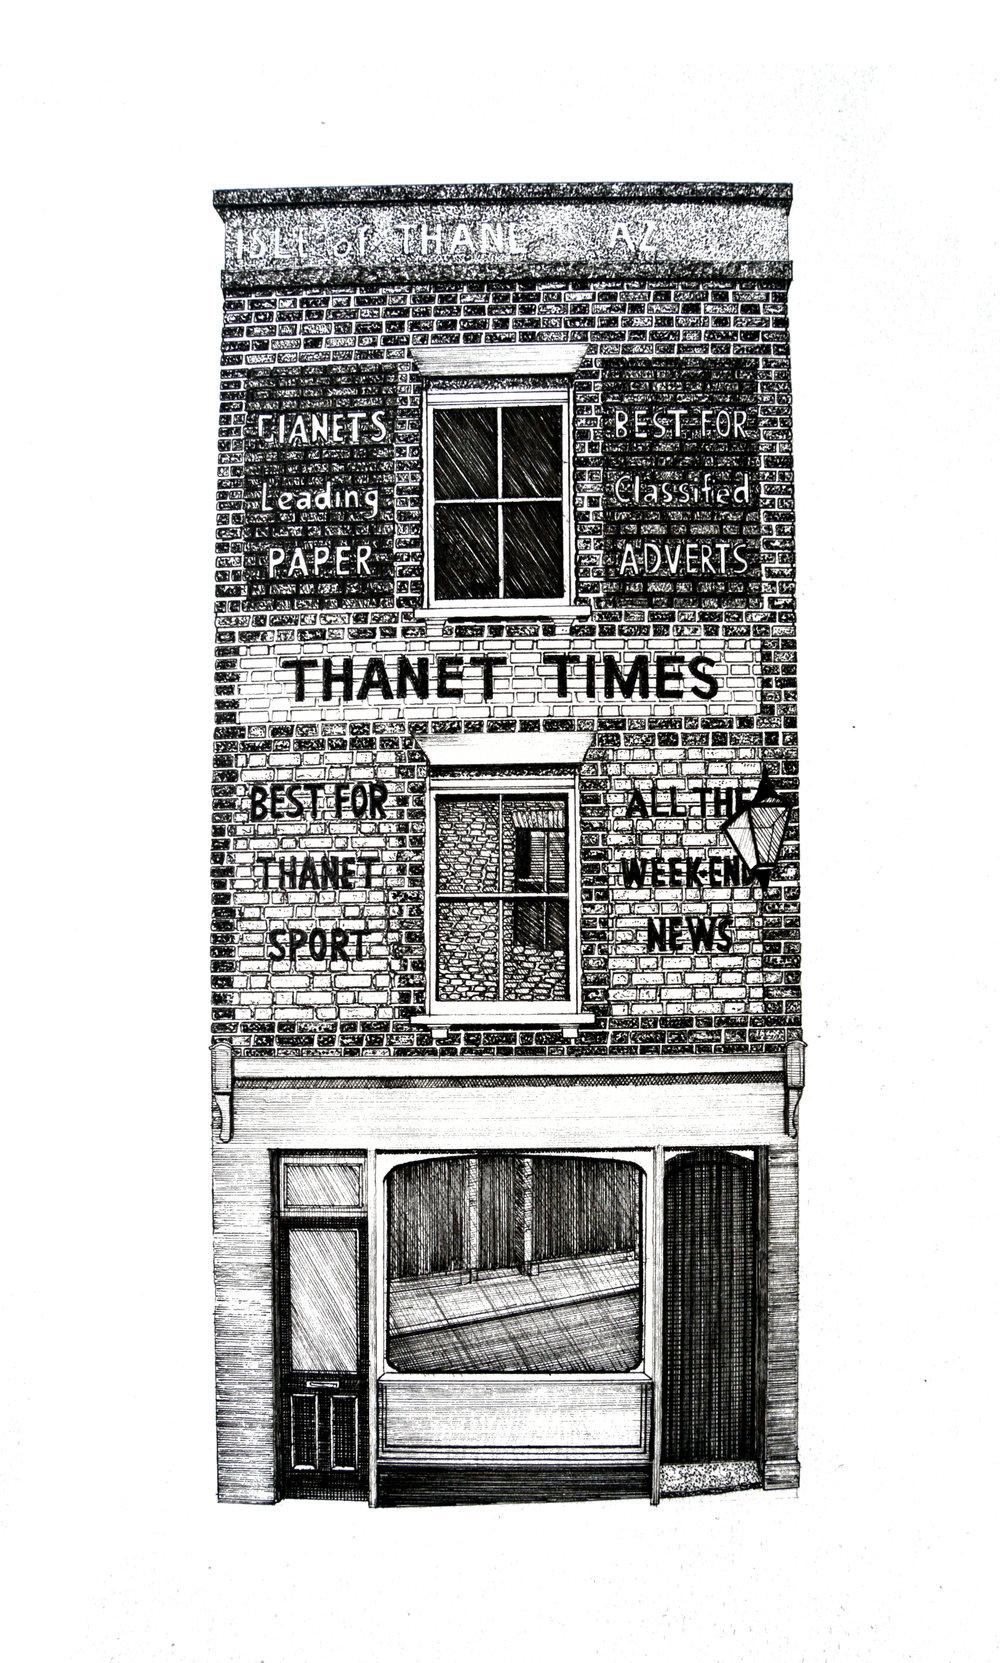 thanet times.jpg